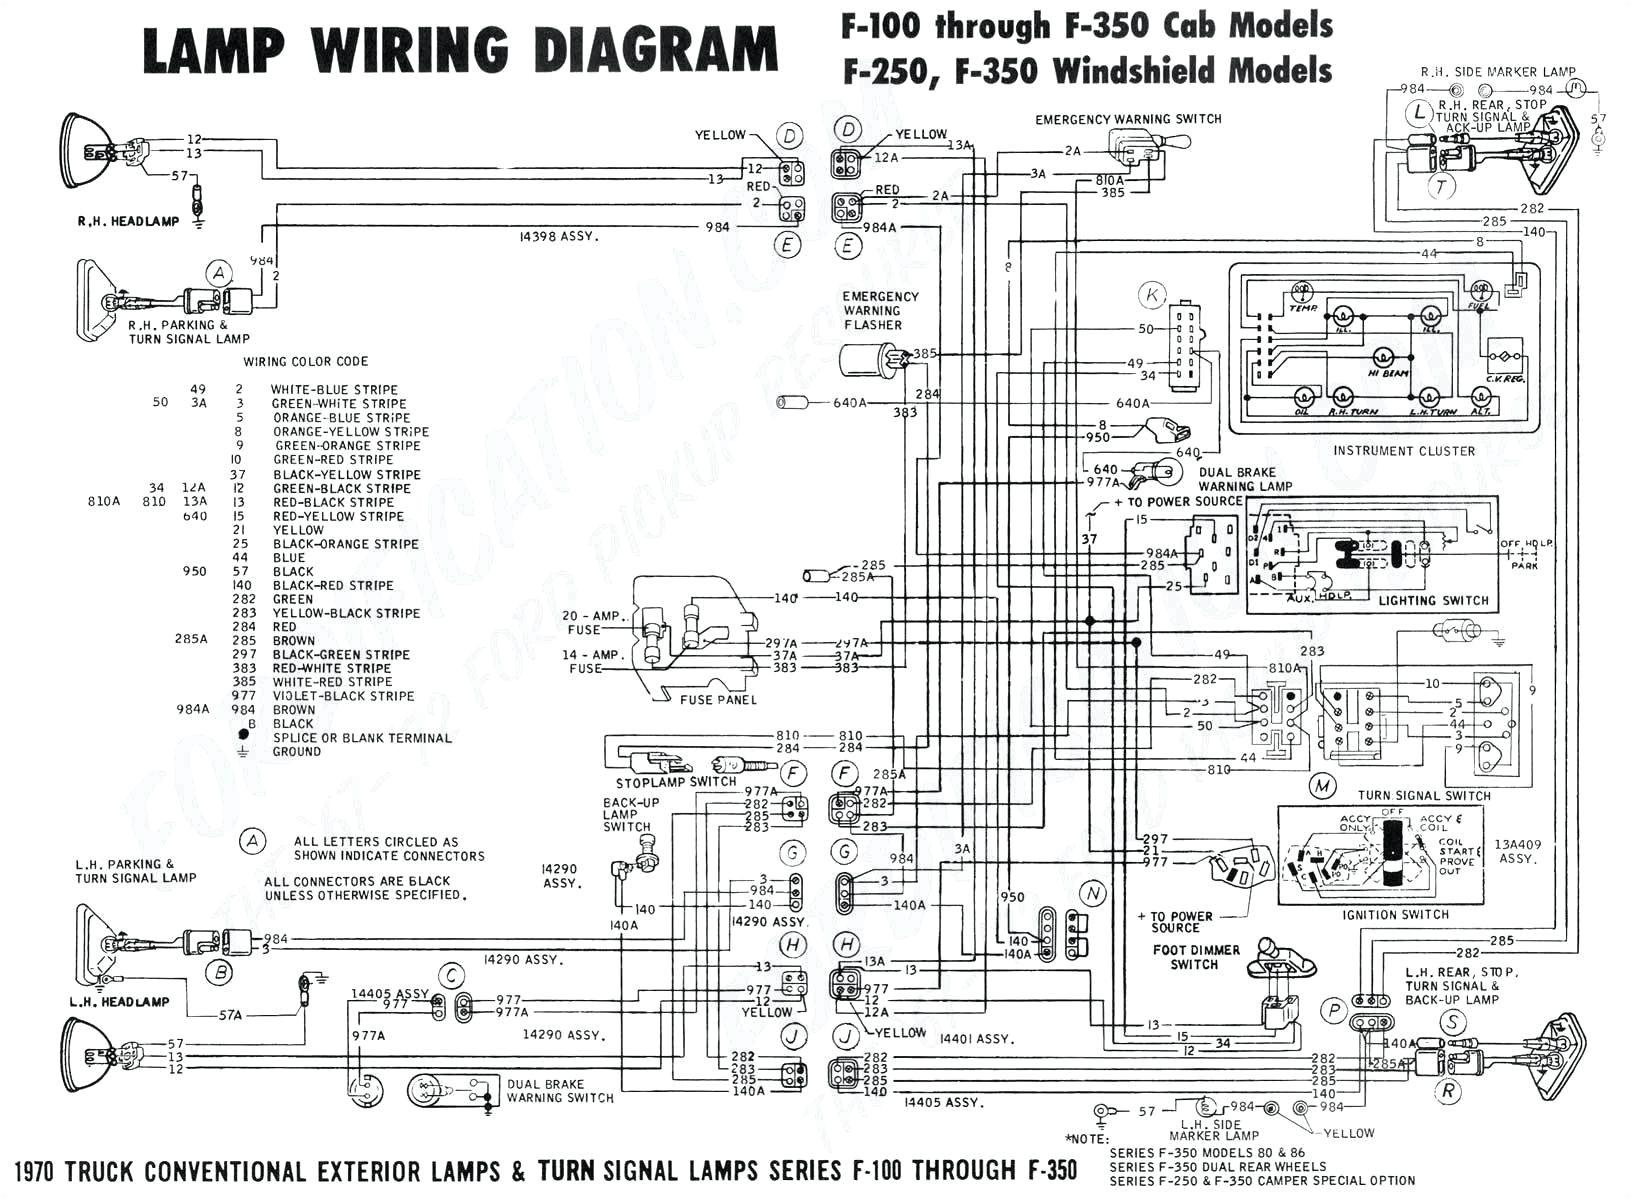 1999 dodge ram radio wiring beautiful radio wiring diagram for a 1999 dodge ram 1500 best thread 2005 of 1999 dodge ram radio wiring jpg